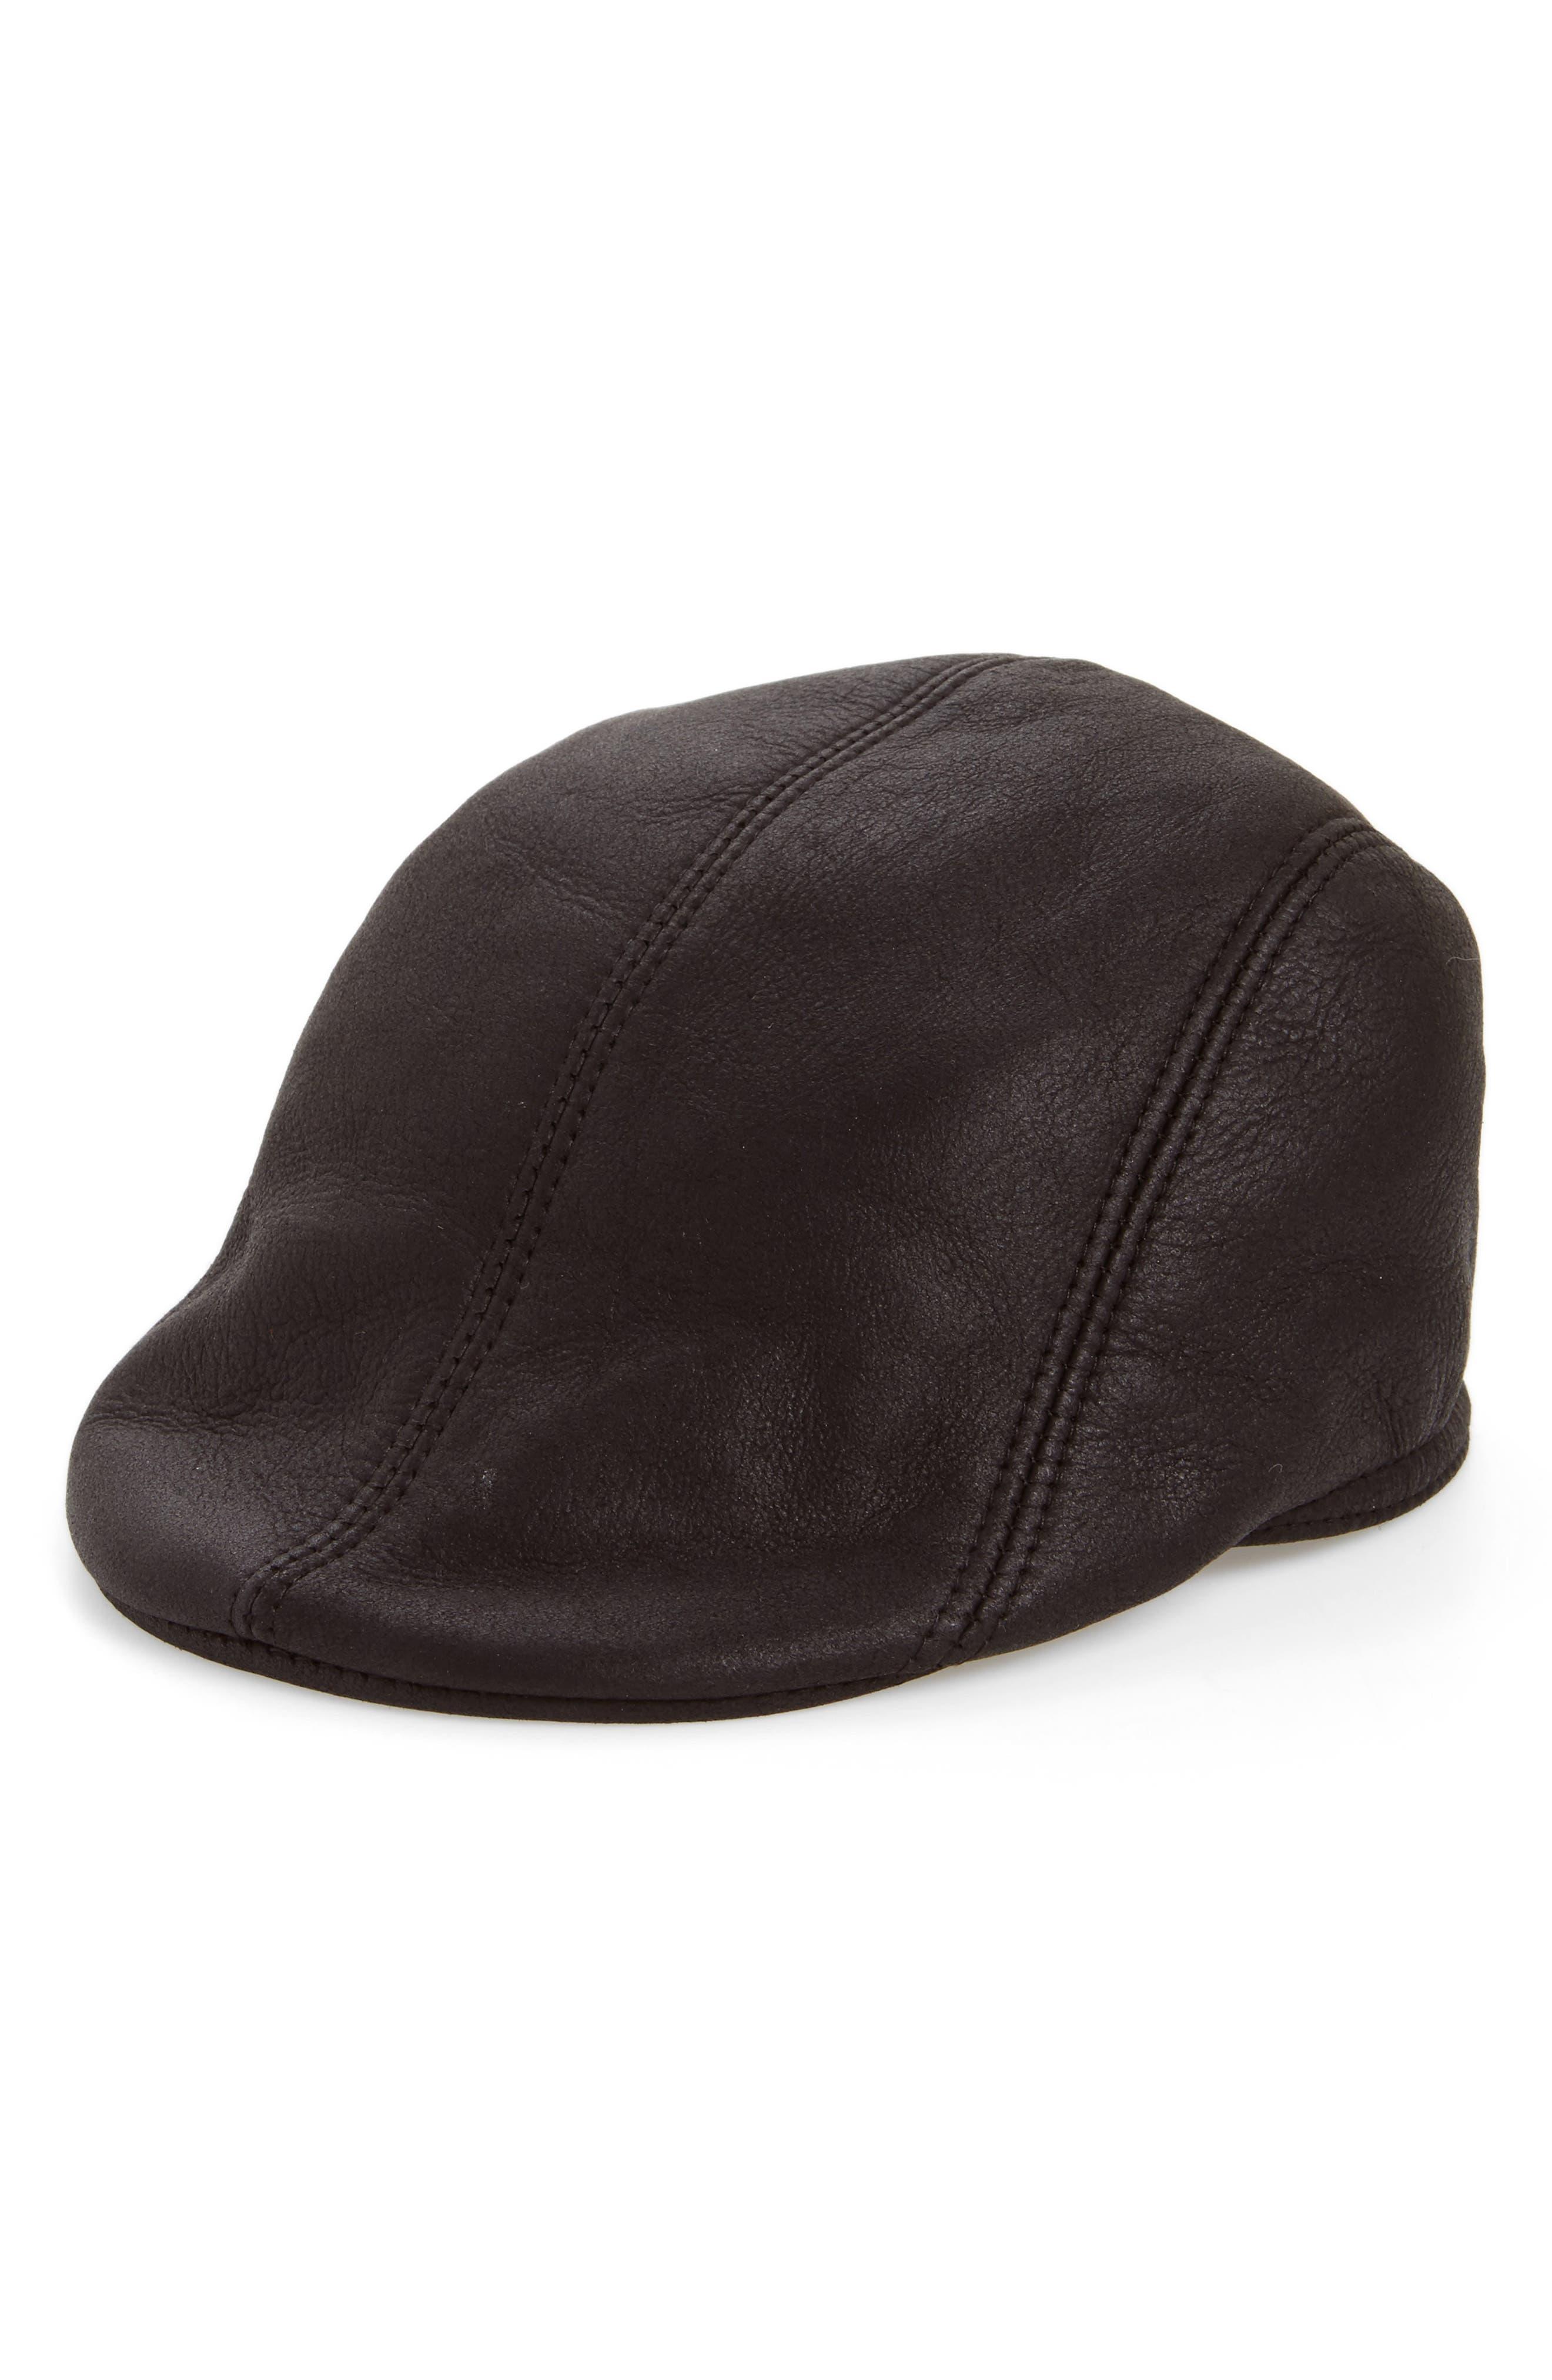 Crown Cap Genuine Shearling Leather Driving Cap